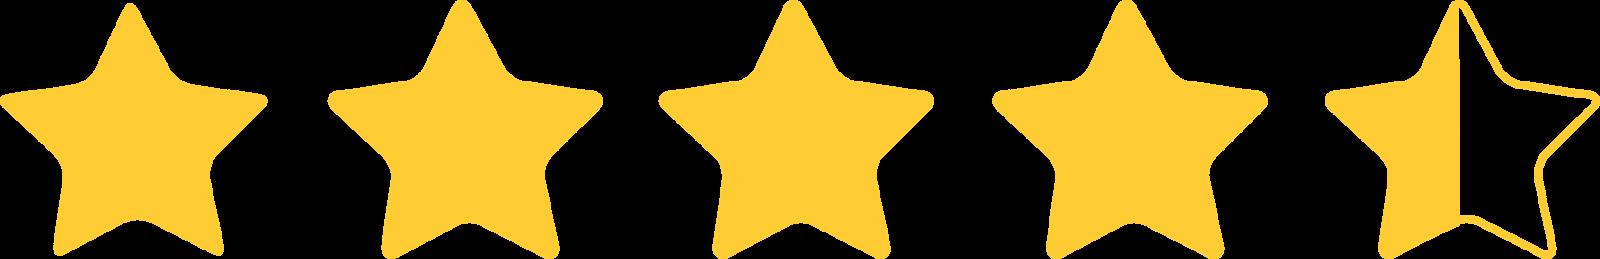 4.2stars